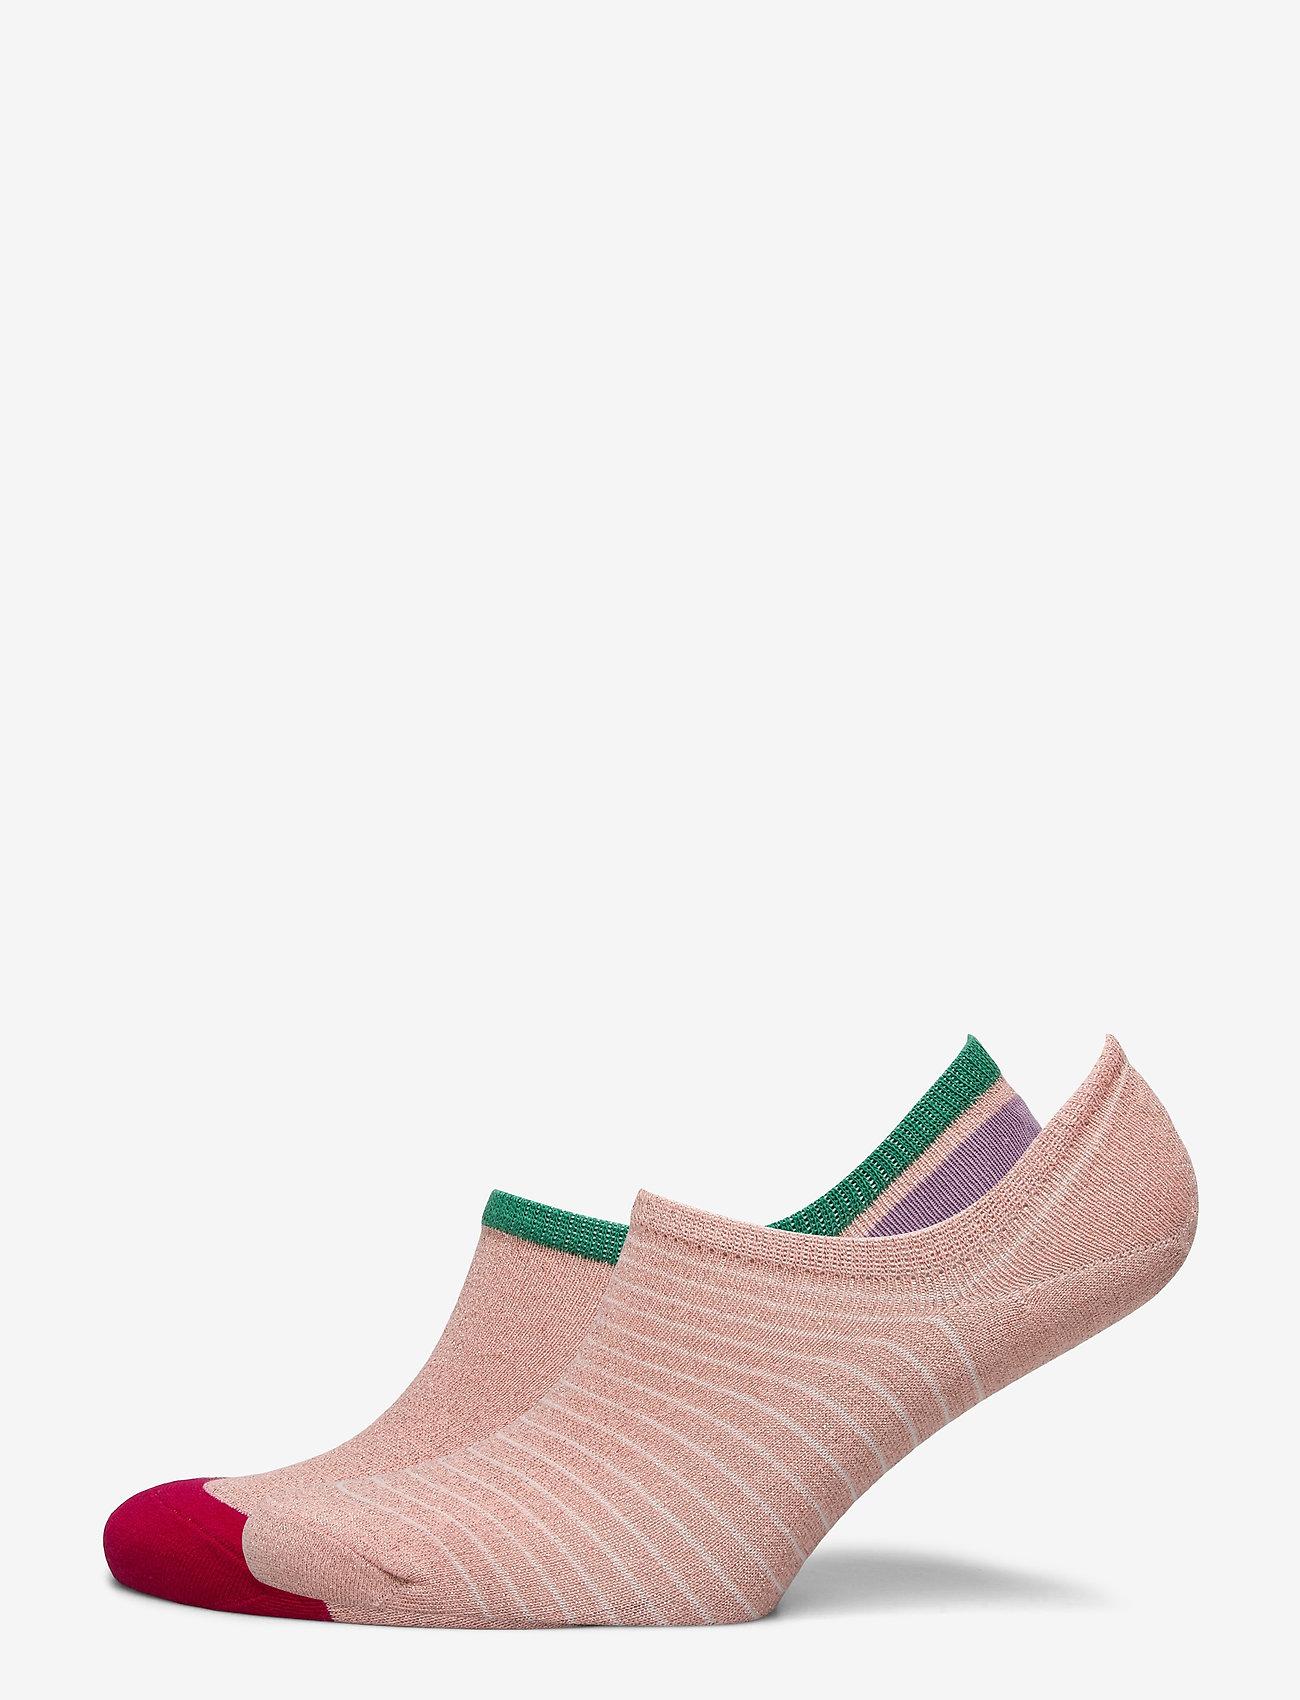 Becksöndergaard - Mix Sock Pack W.10 - steps & footies - dustypink/dusty - 0